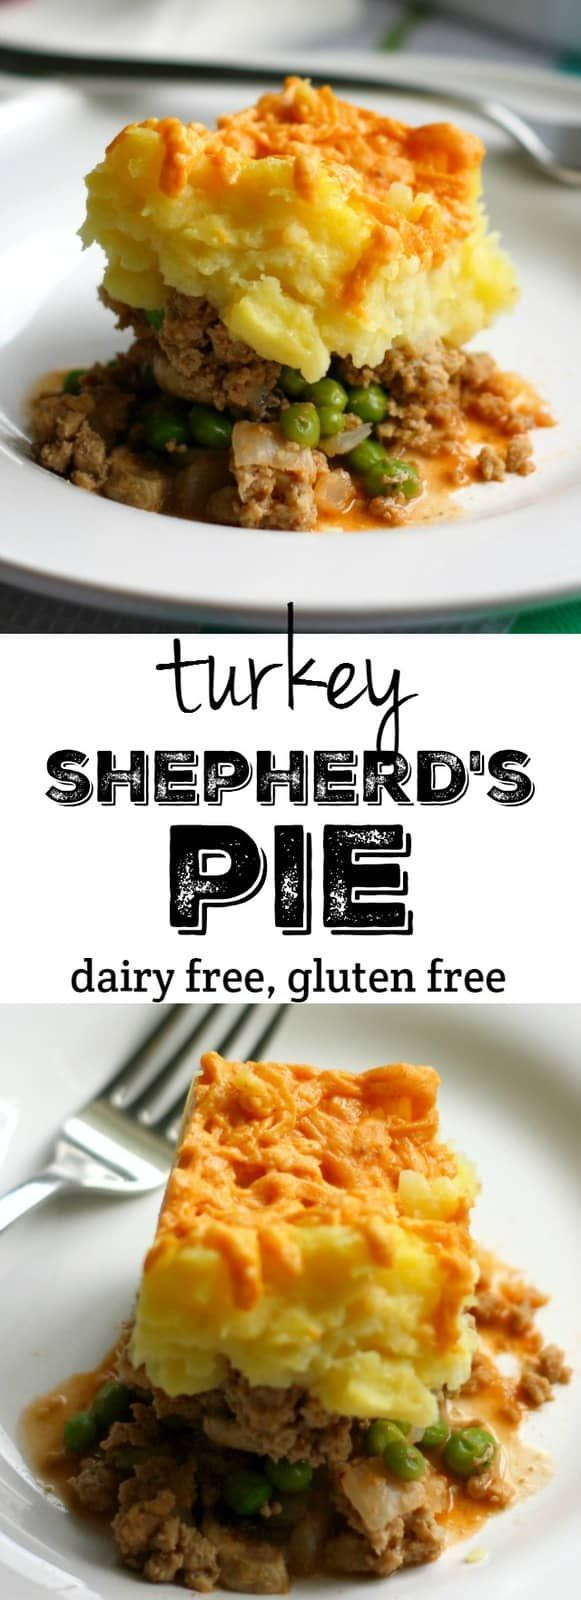 Turkey Shepherd's Pie   Recipe   Dairy free dinner, Food ...